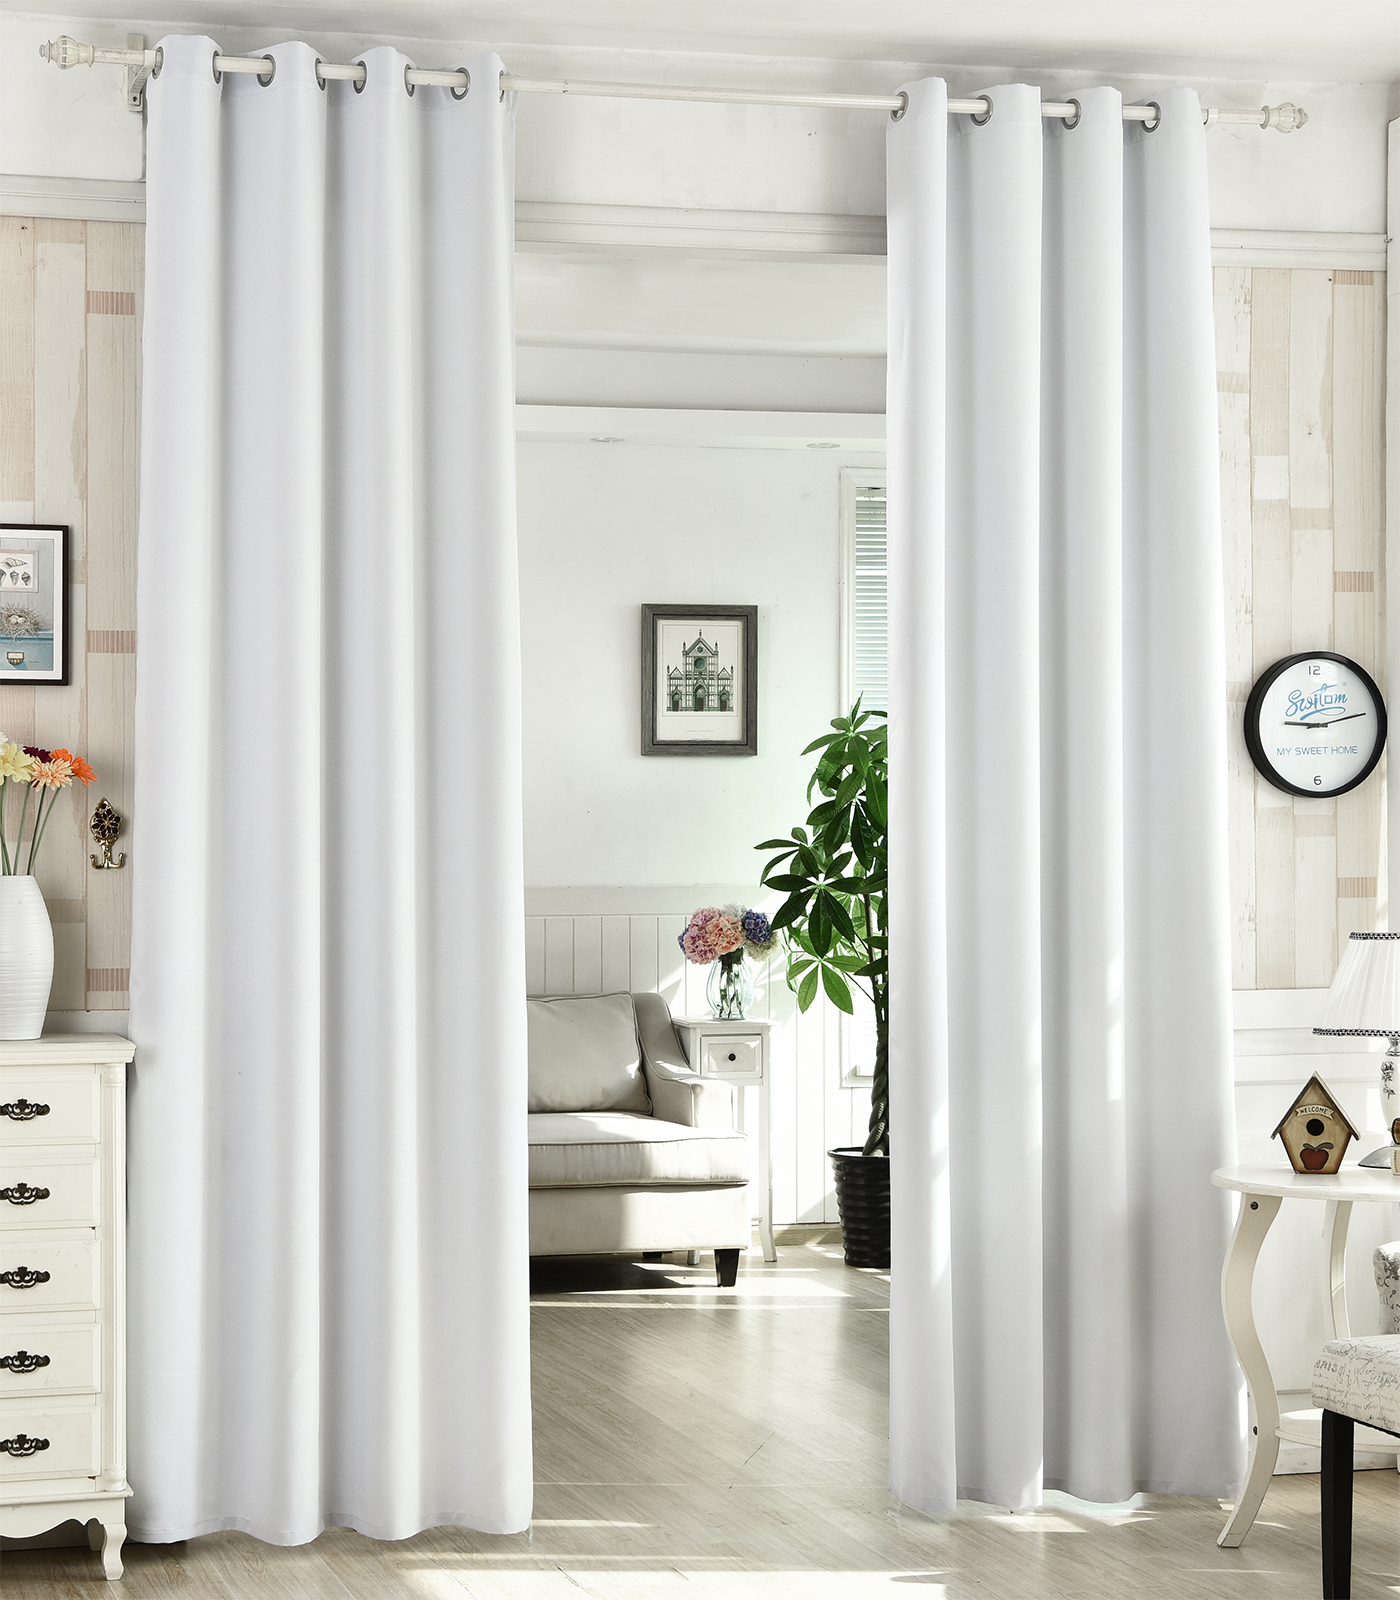 2er gardinen vorhang blickdicht sen leicht verdunklungsvorh nge schal sctn03 a ebay. Black Bedroom Furniture Sets. Home Design Ideas